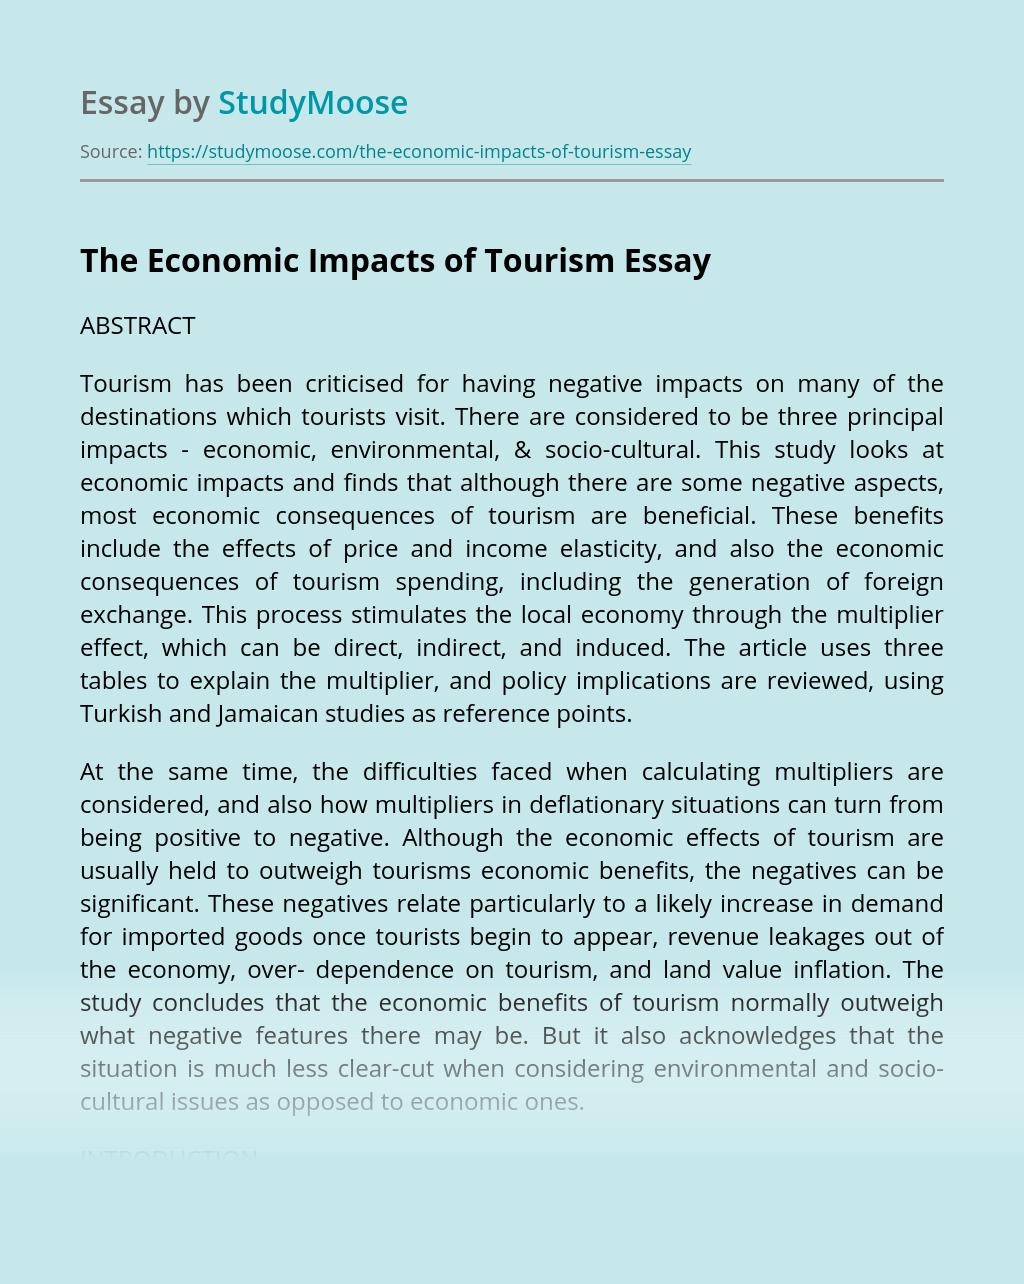 The Economic Impacts of Tourism